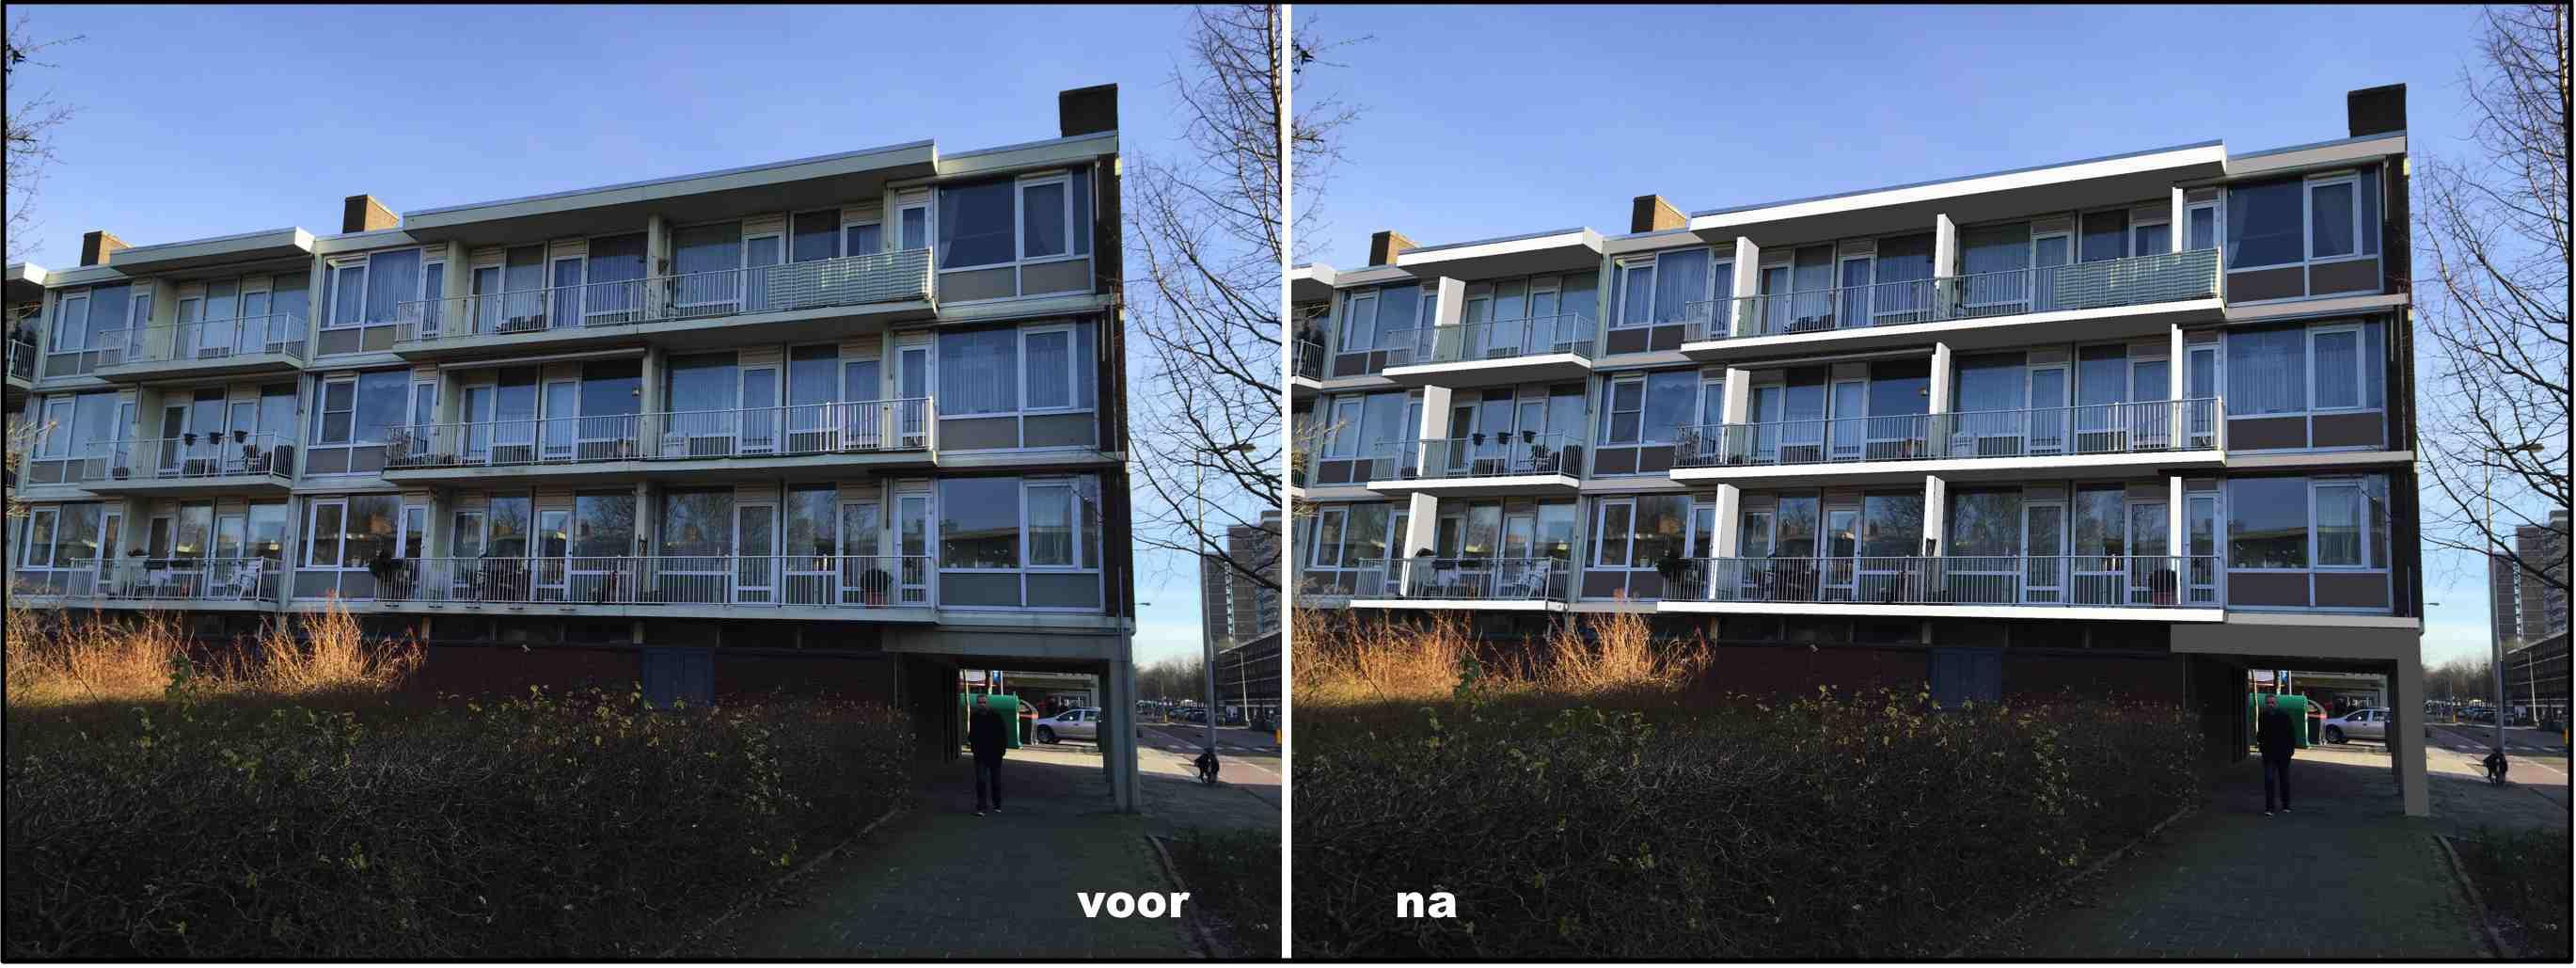 anetgoemans-oldenhorst amsterdam-zuidas-kleurenplan-1